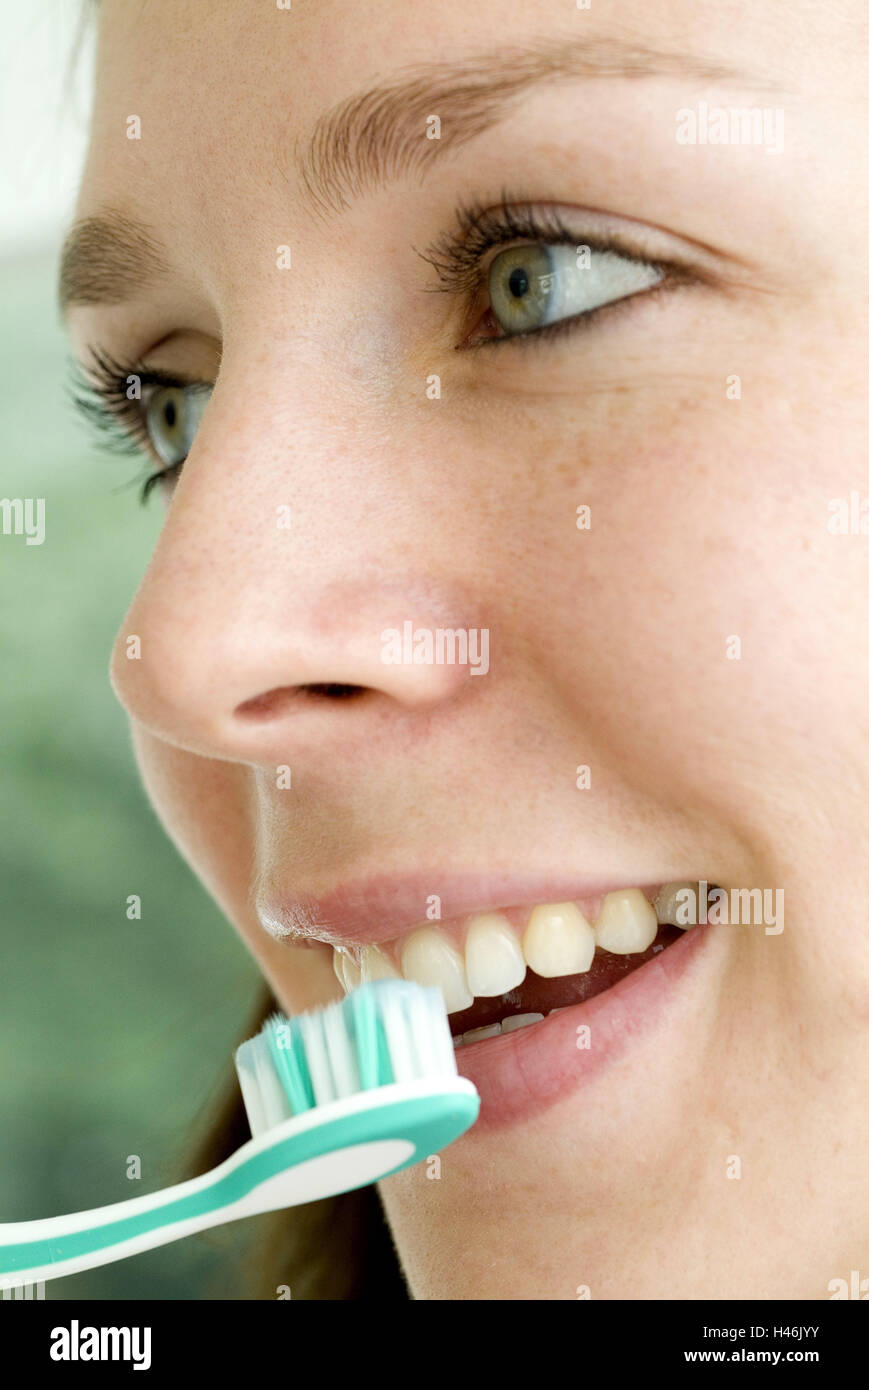 maintain personal hygiene